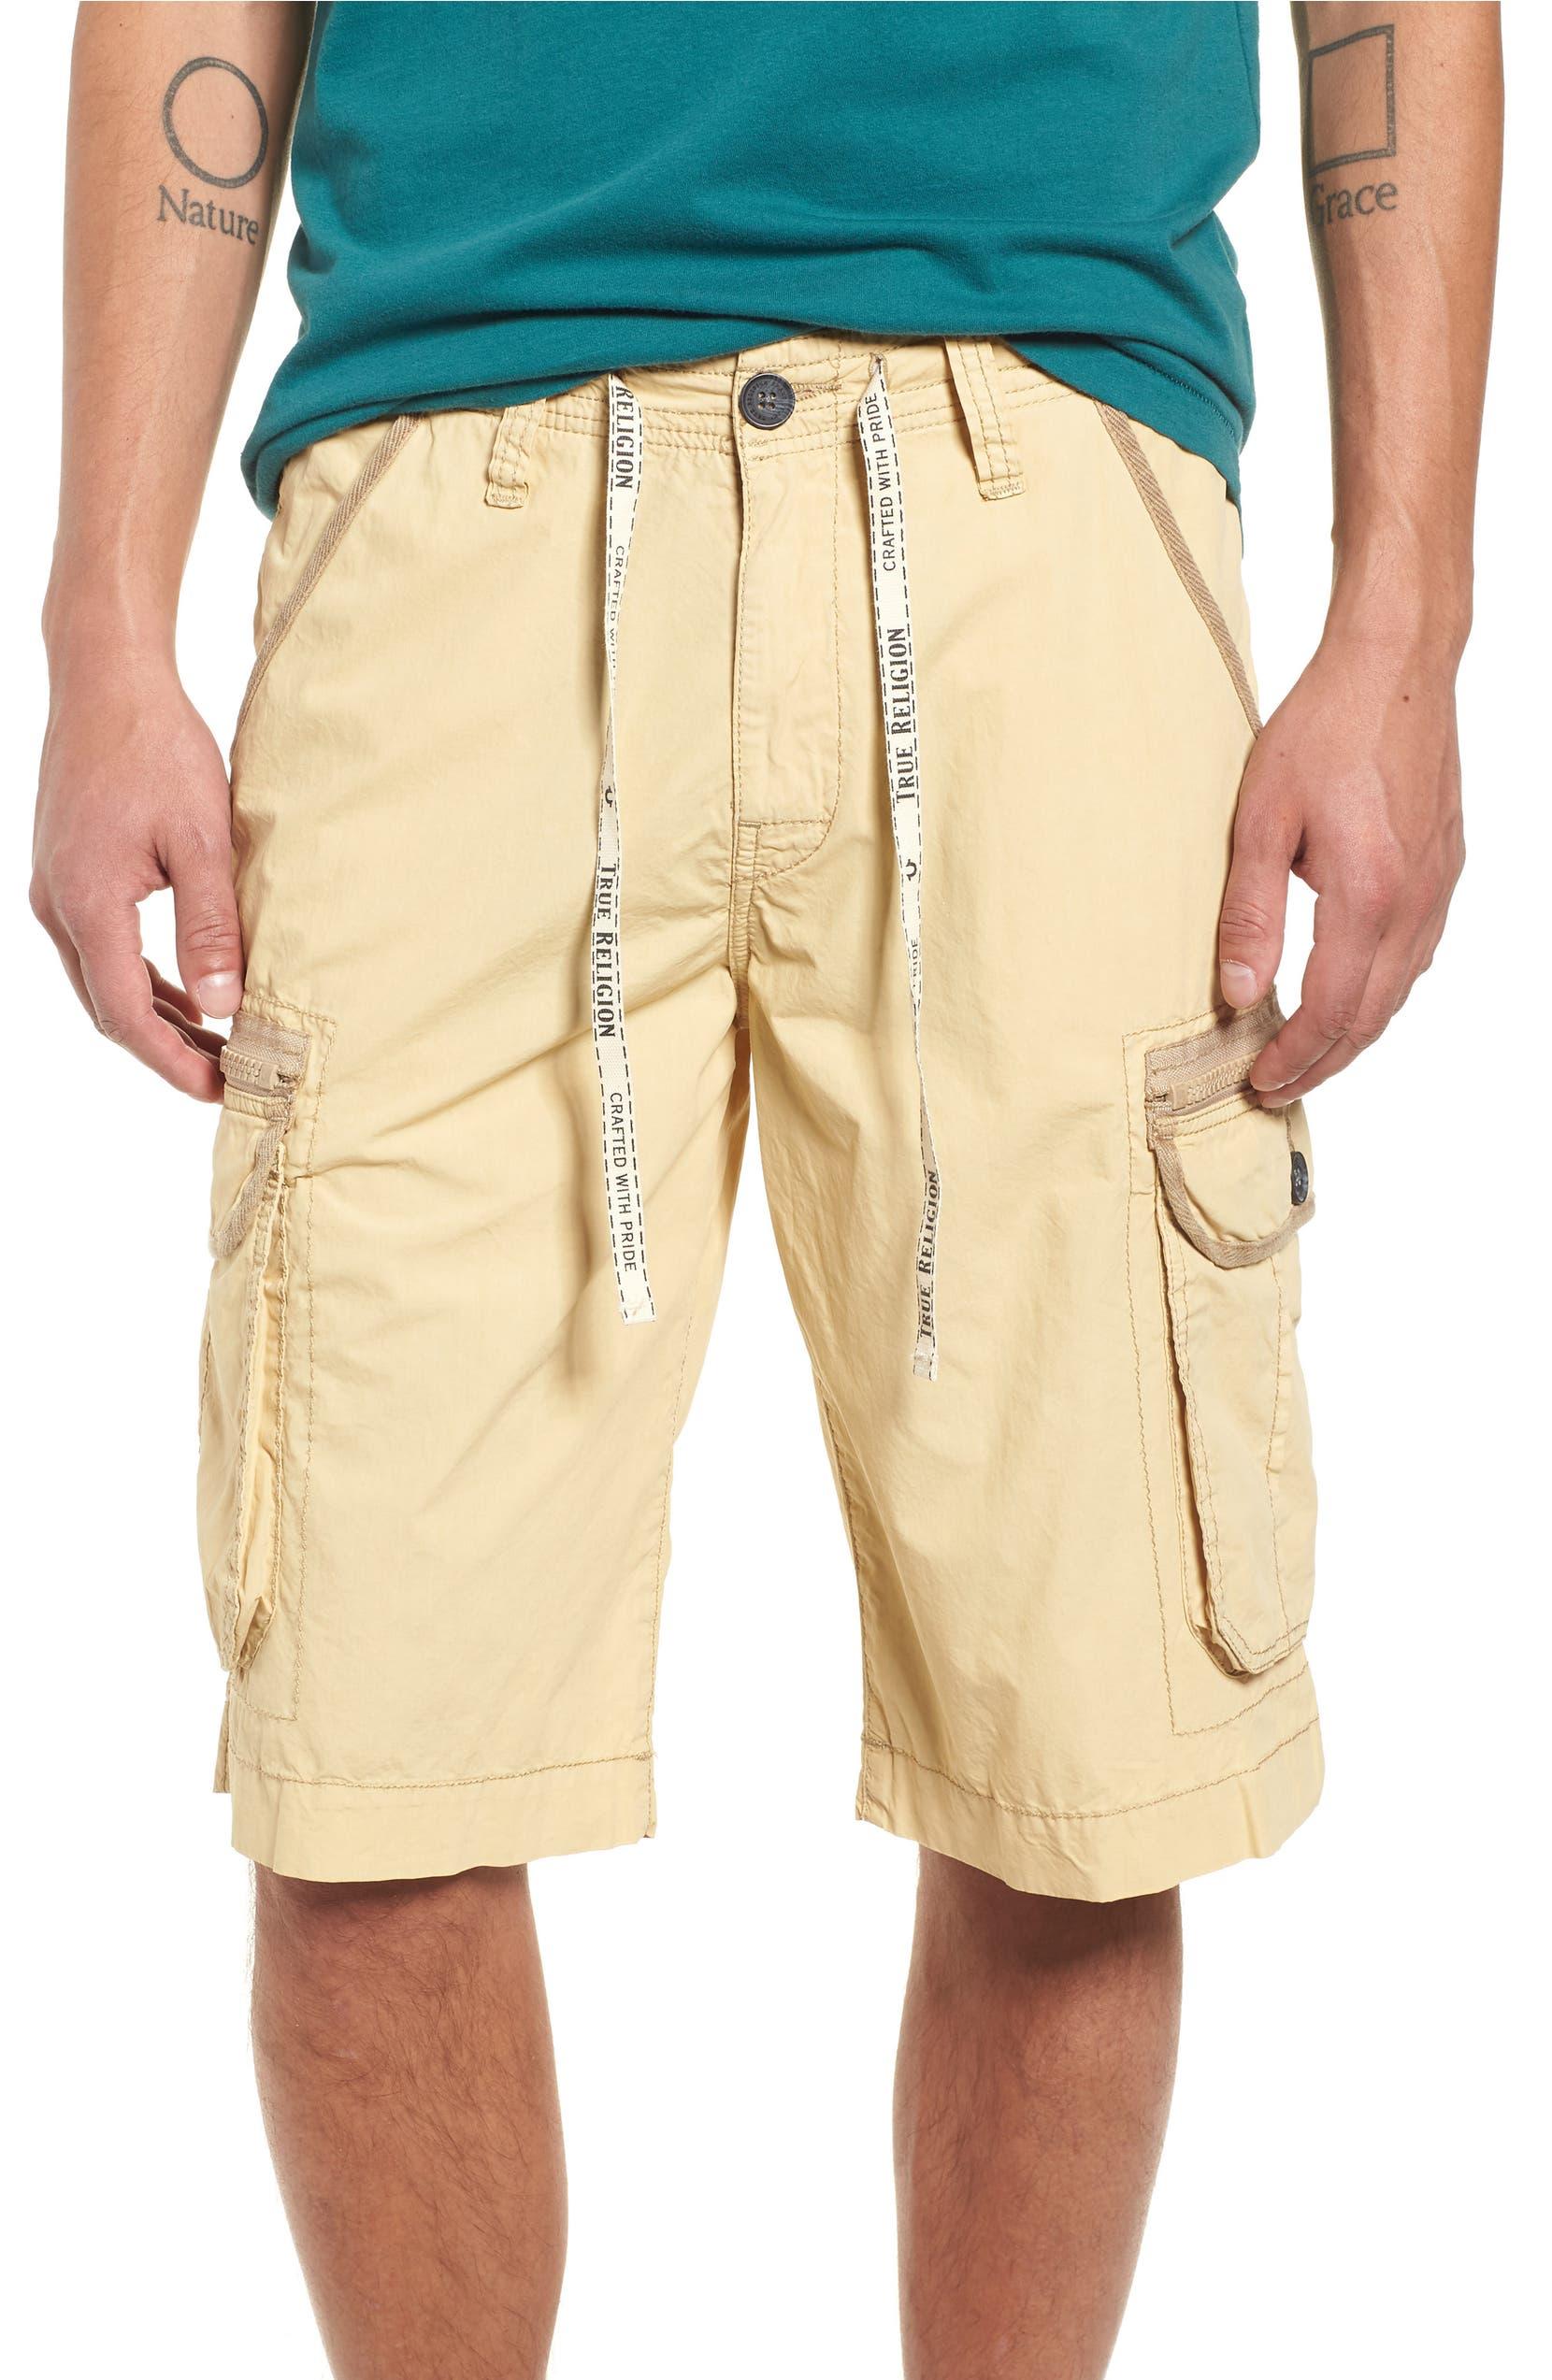 19545a9acc True Religion Brand Jeans Terrain Cargo Shorts   Nordstrom